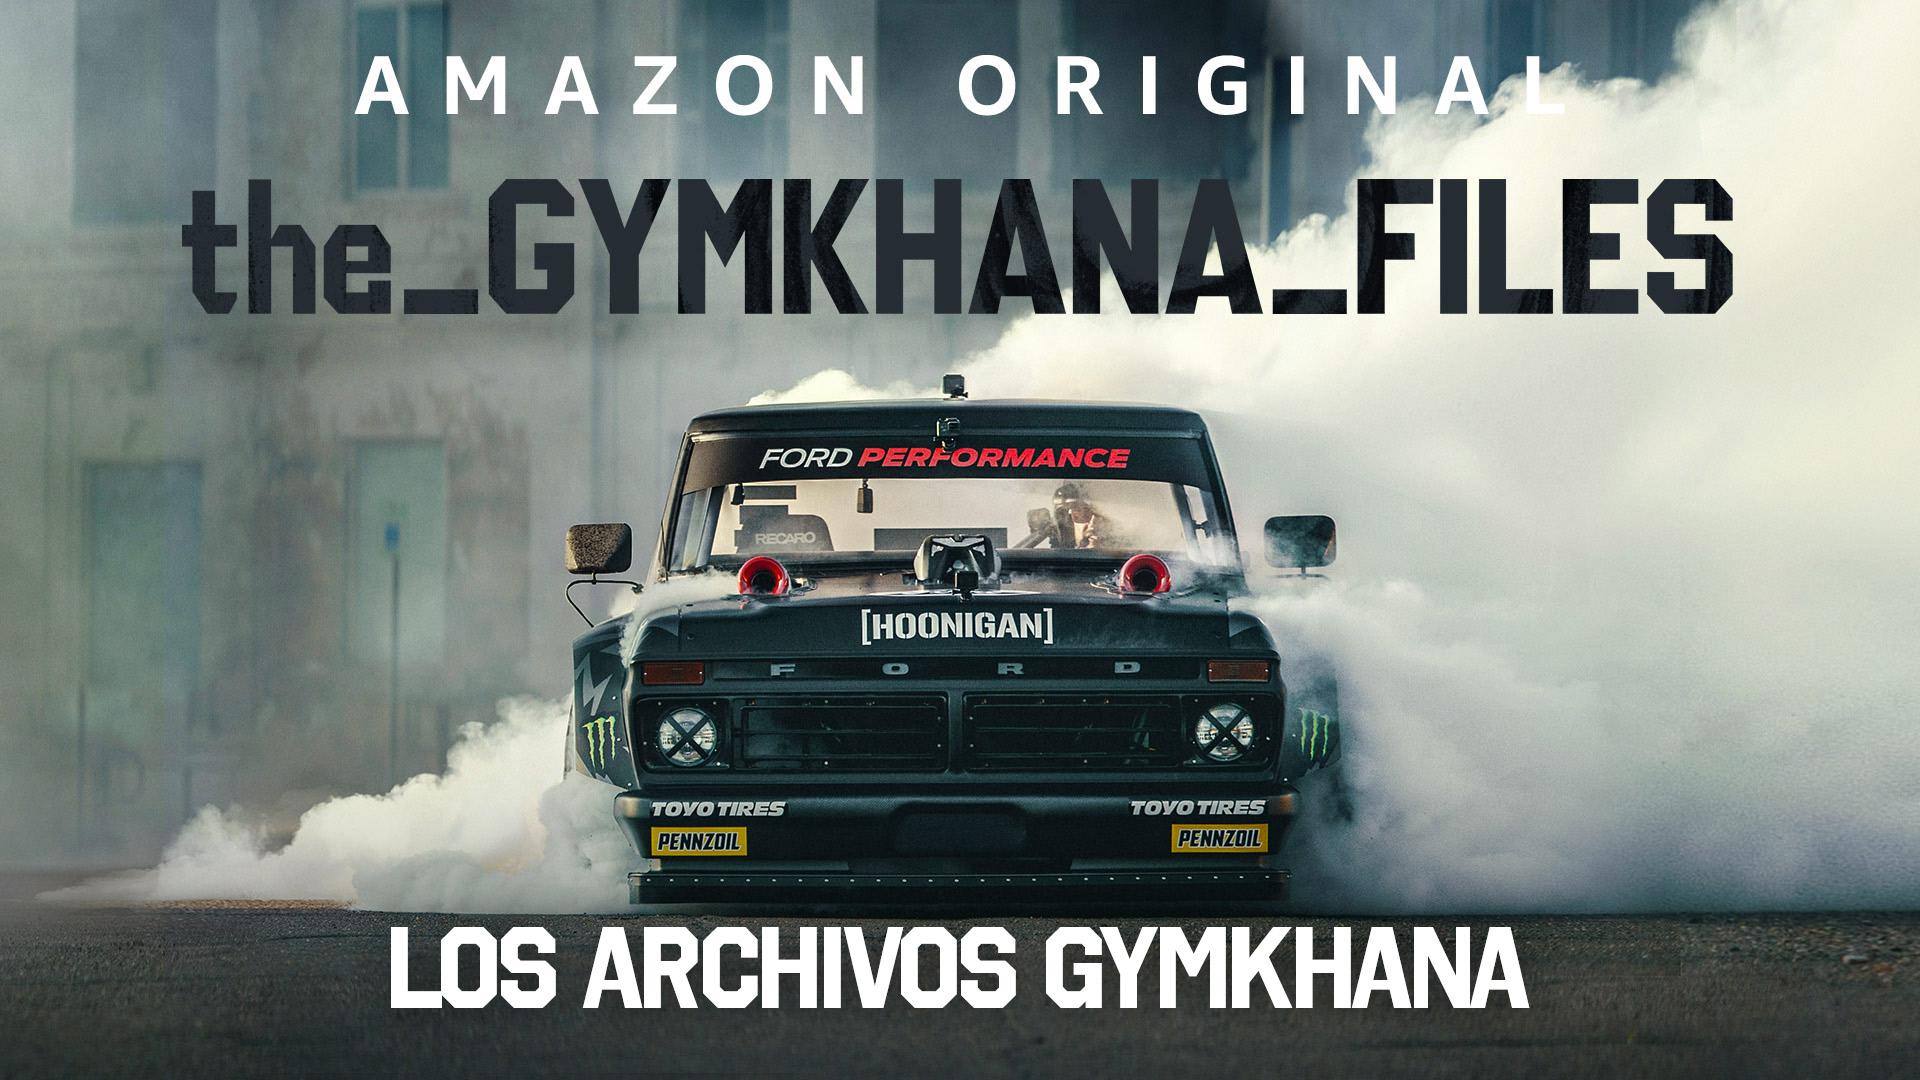 Los archivos Gymkhana - Temporada 1